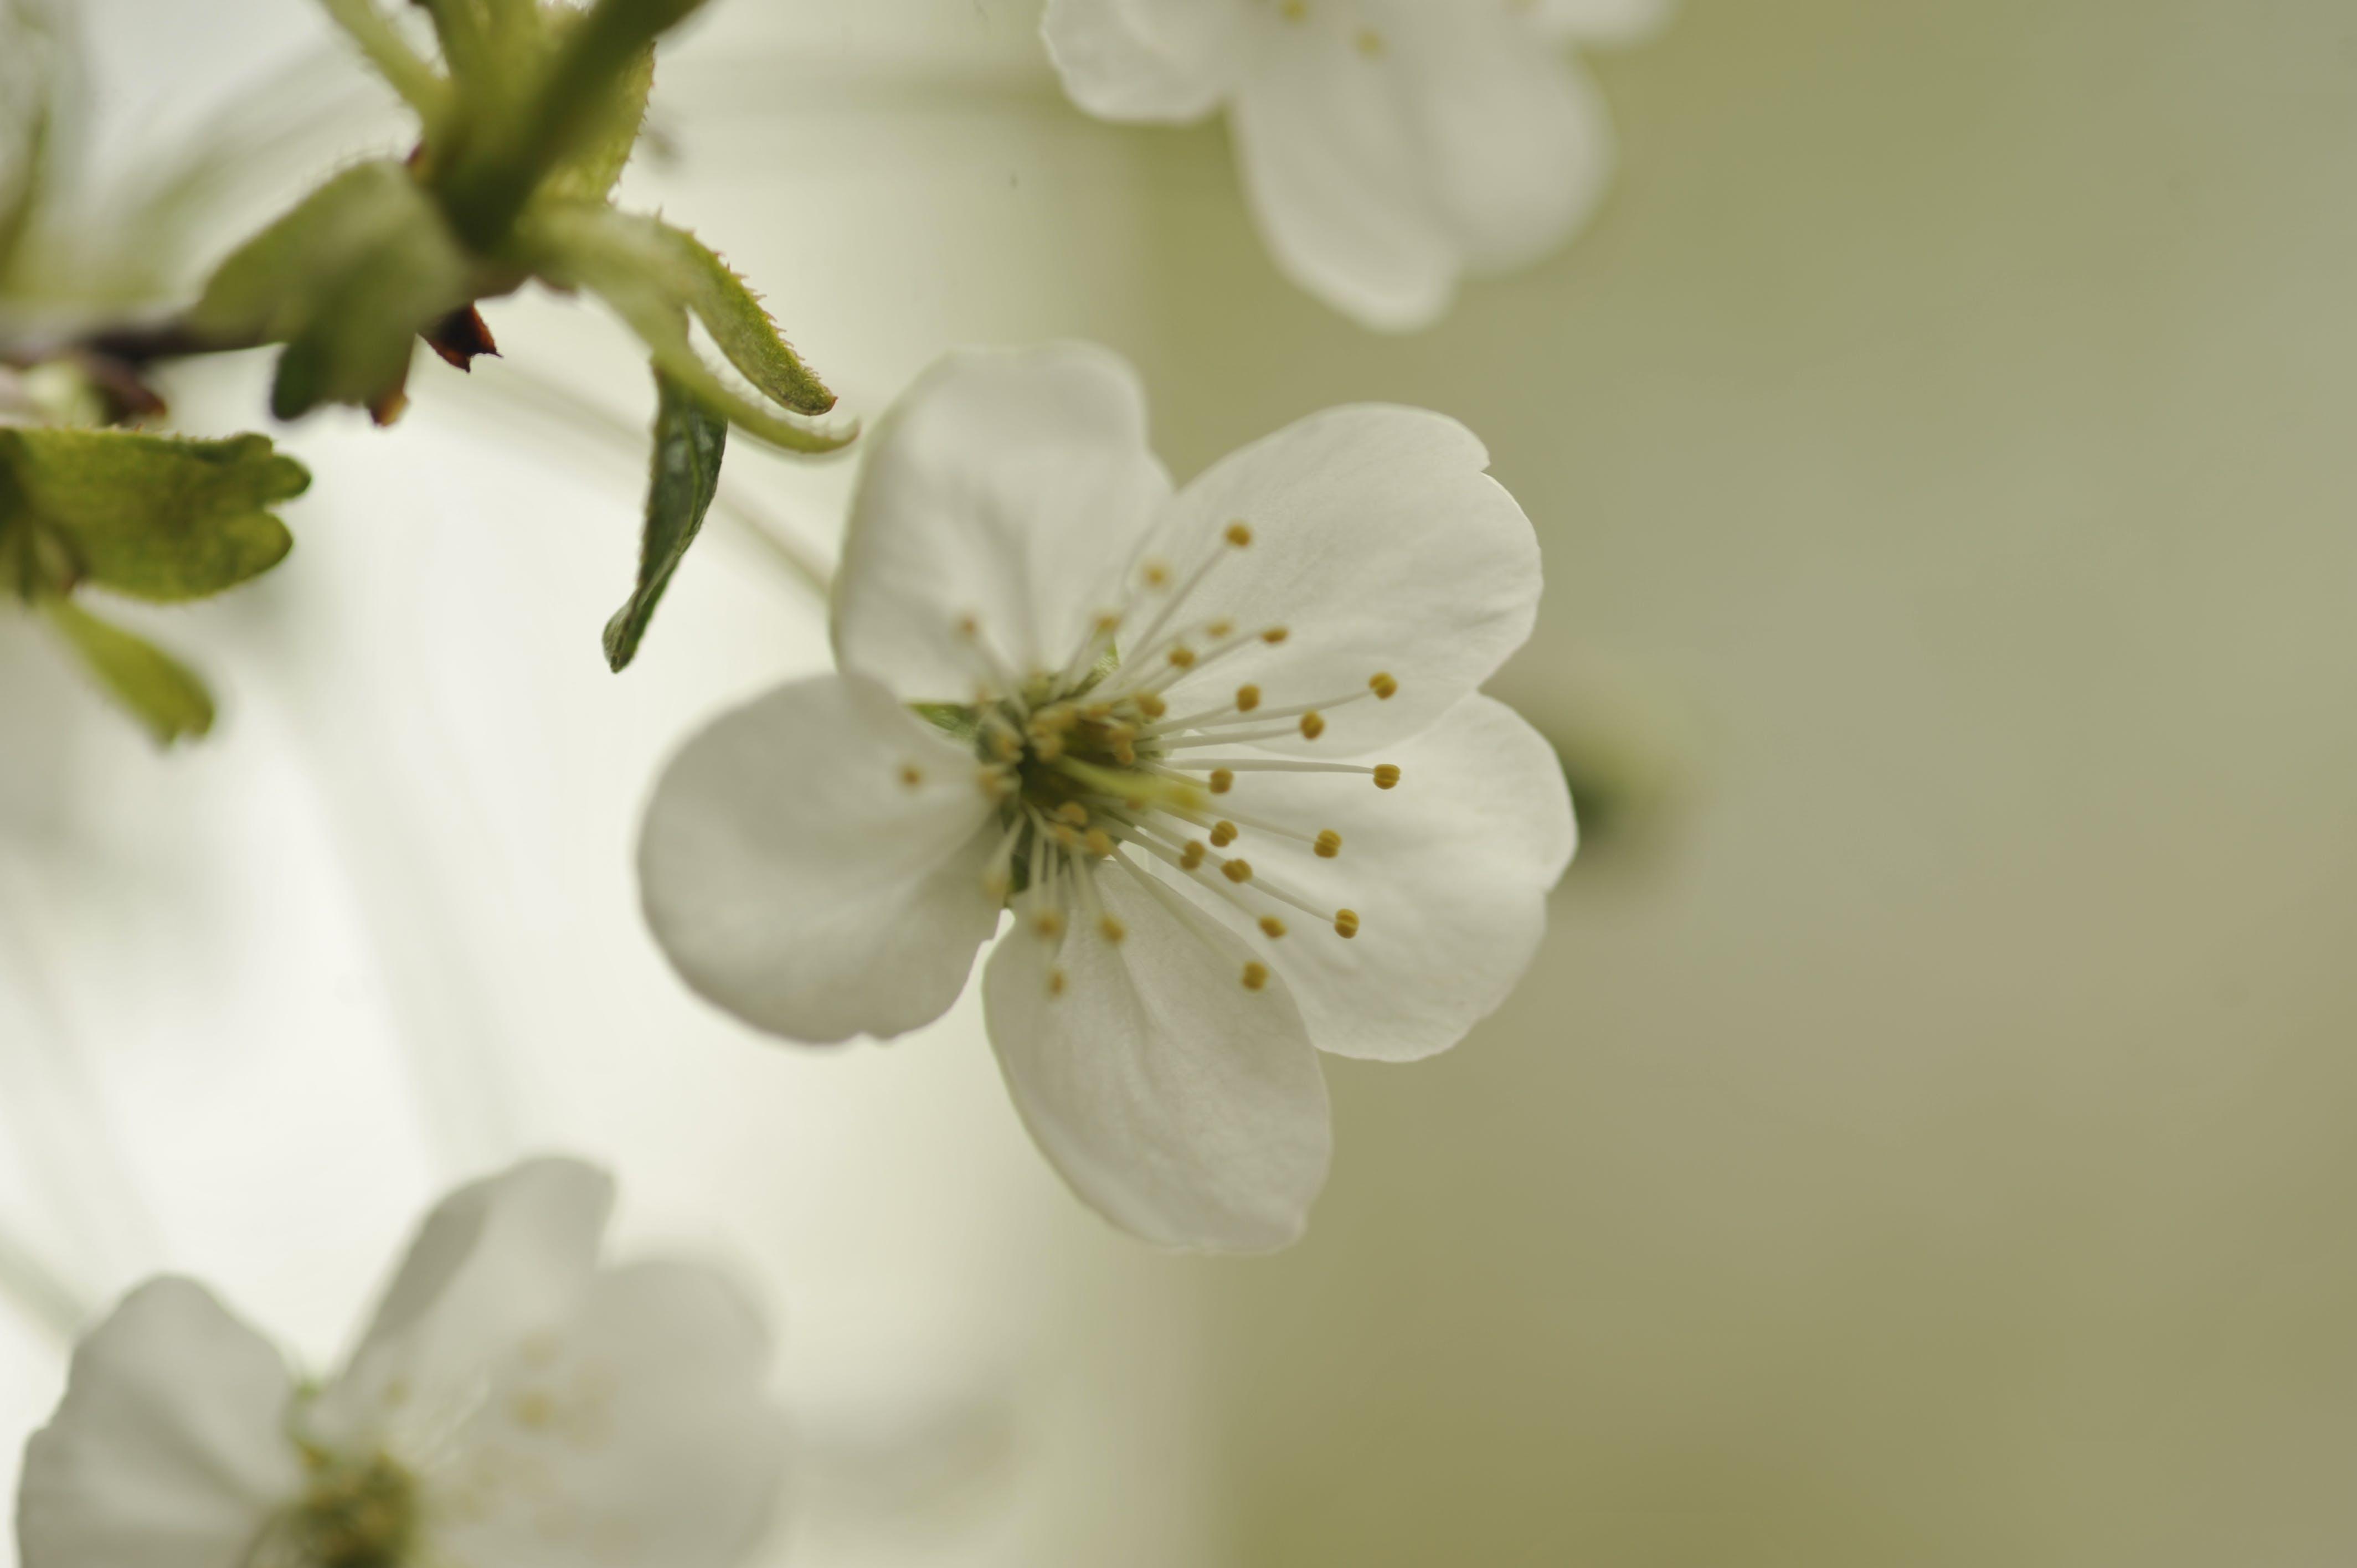 Free stock photo of spring, hot spring, spring flower, spring flowers